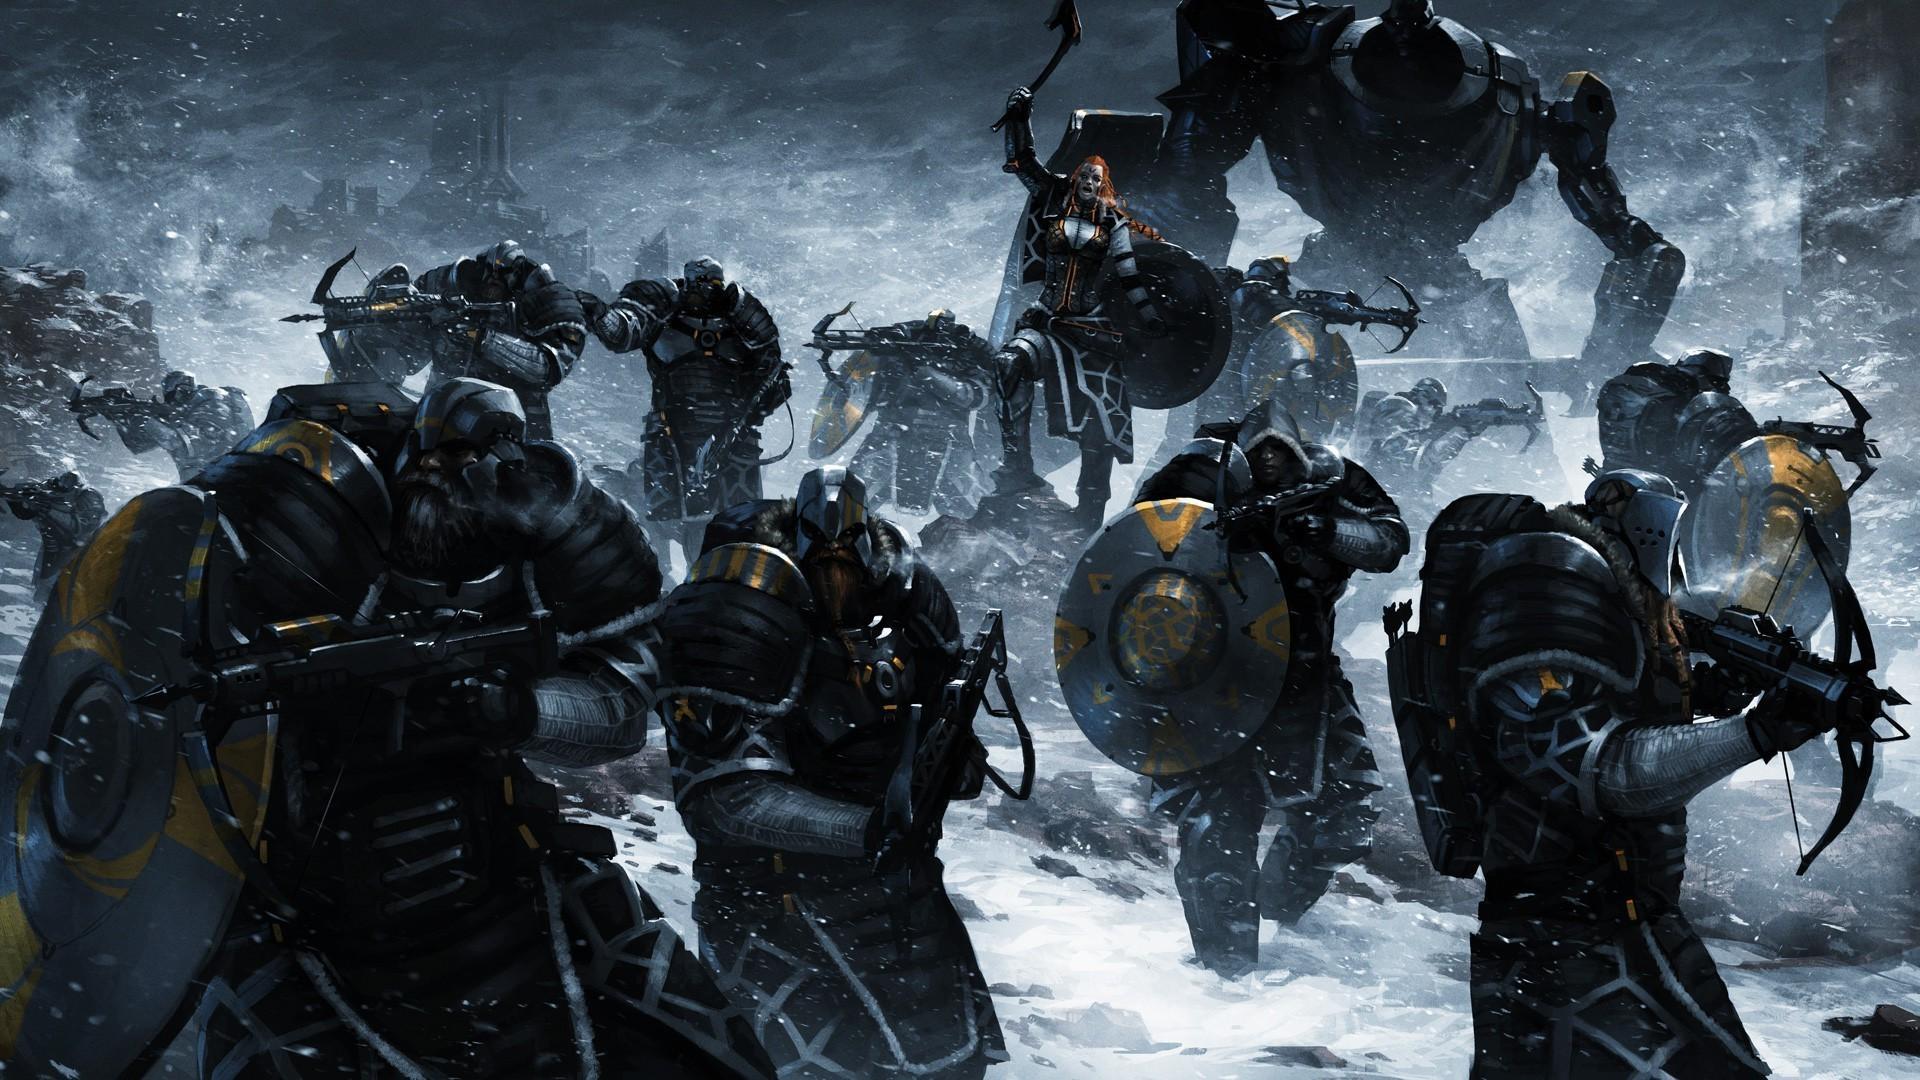 fantasy Art, Endless Legend Wallpapers HD / Desktop and Mobile Backgrounds